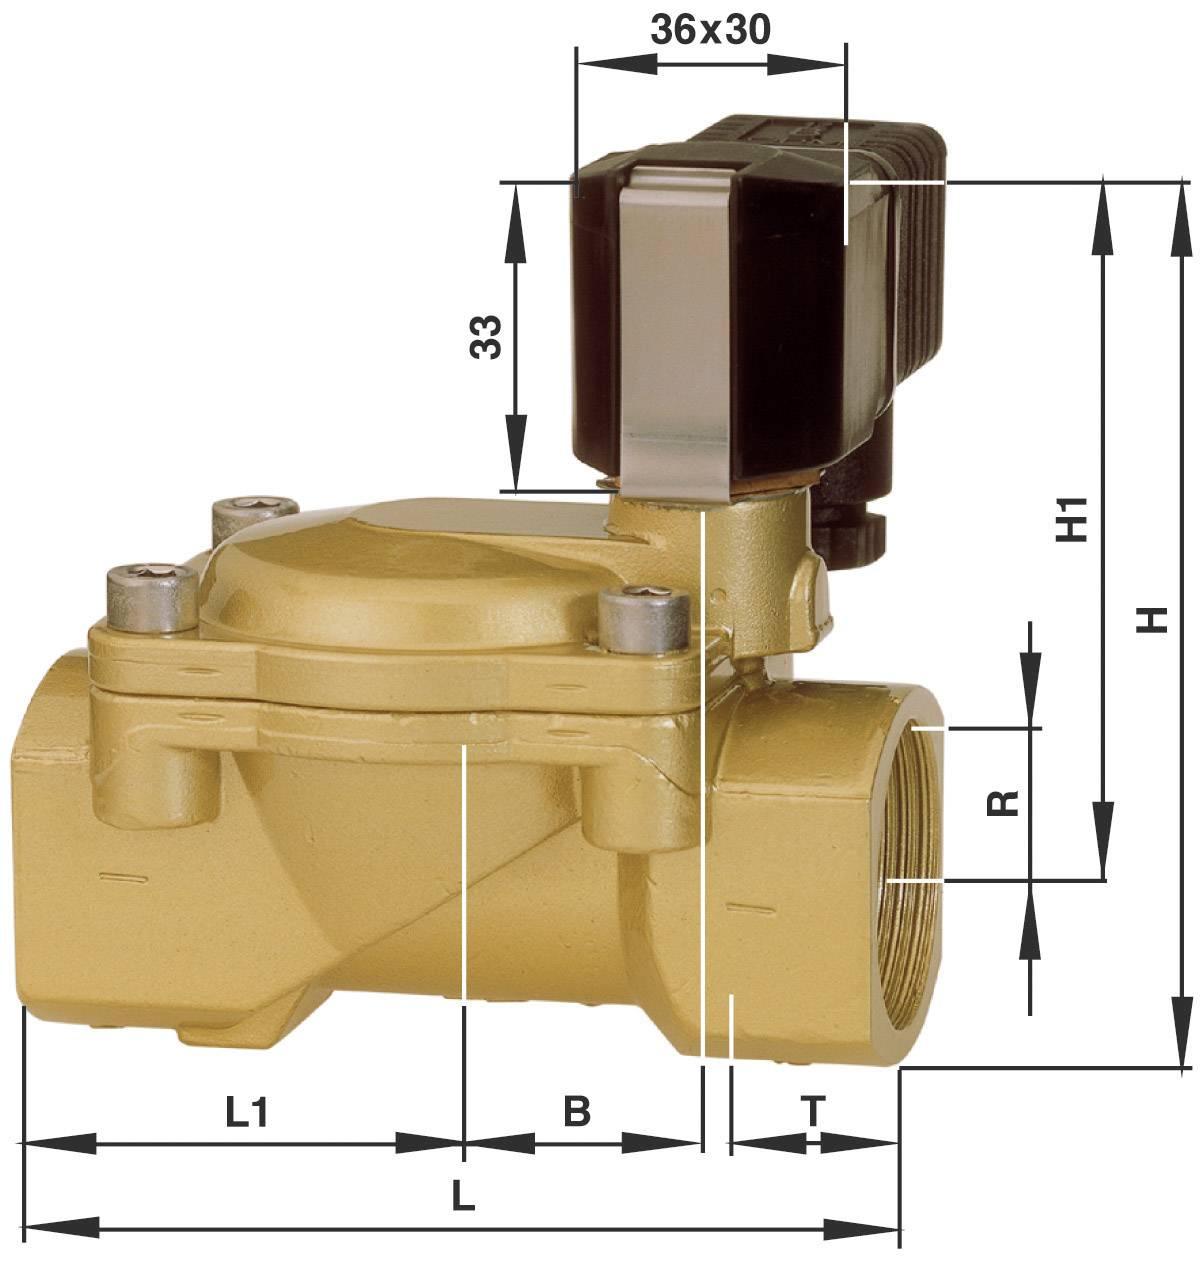 2/2-cestný elektromagnetický ventil Busch Jost 8240500.9101.23050, G1 1/4, 230 V/AC